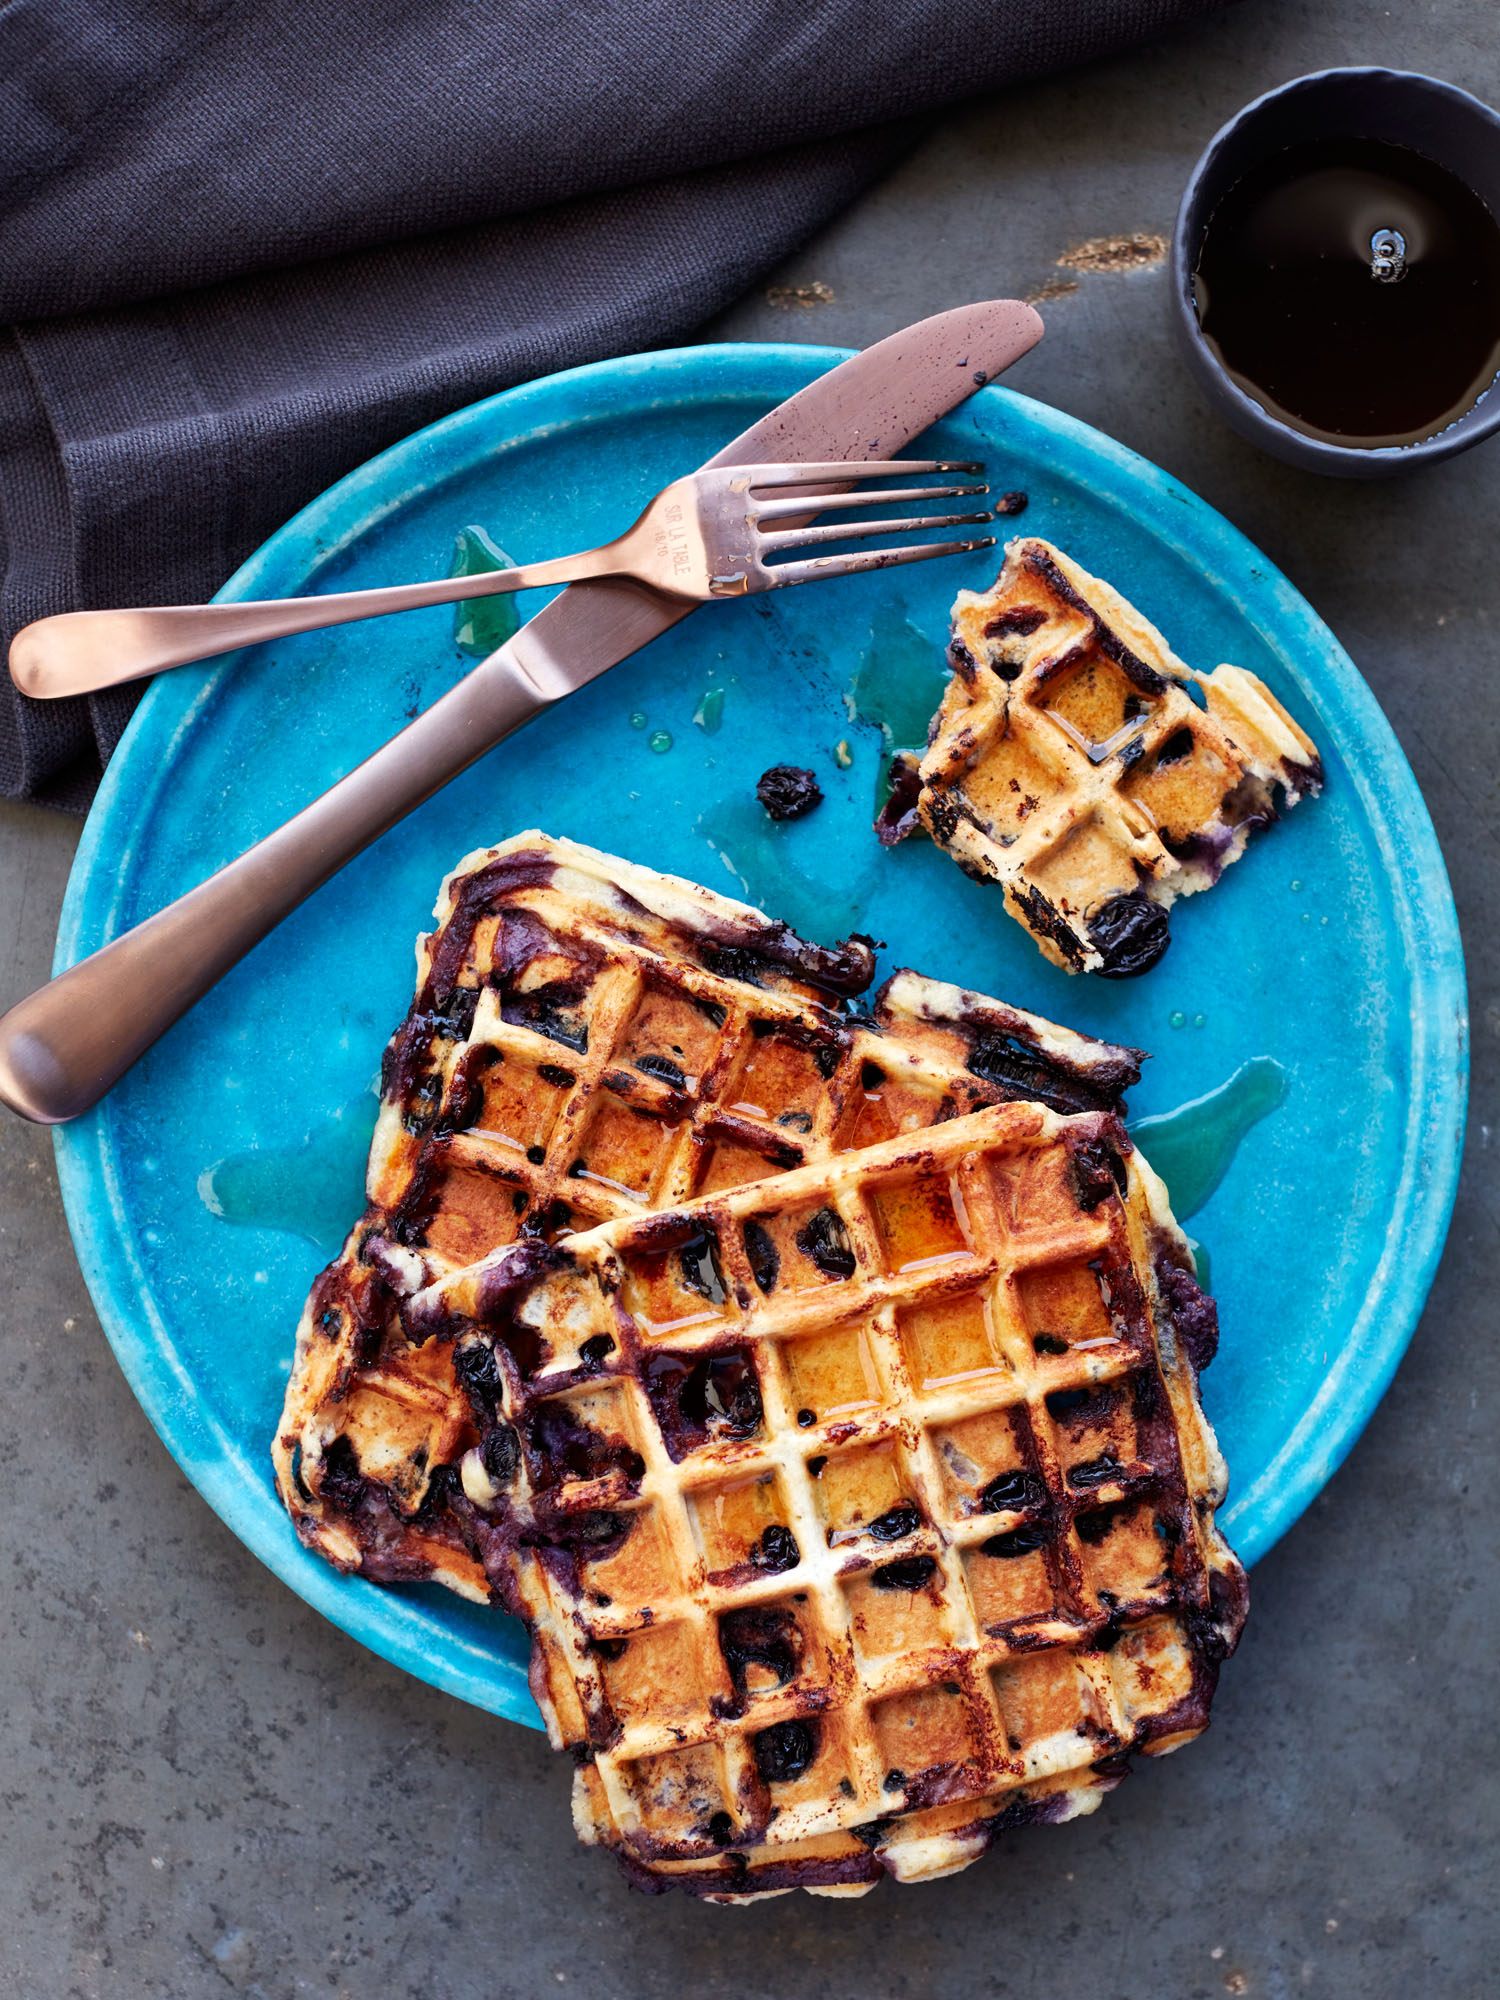 20160719_DrJulia_Blueberry-Waffles006.jpg